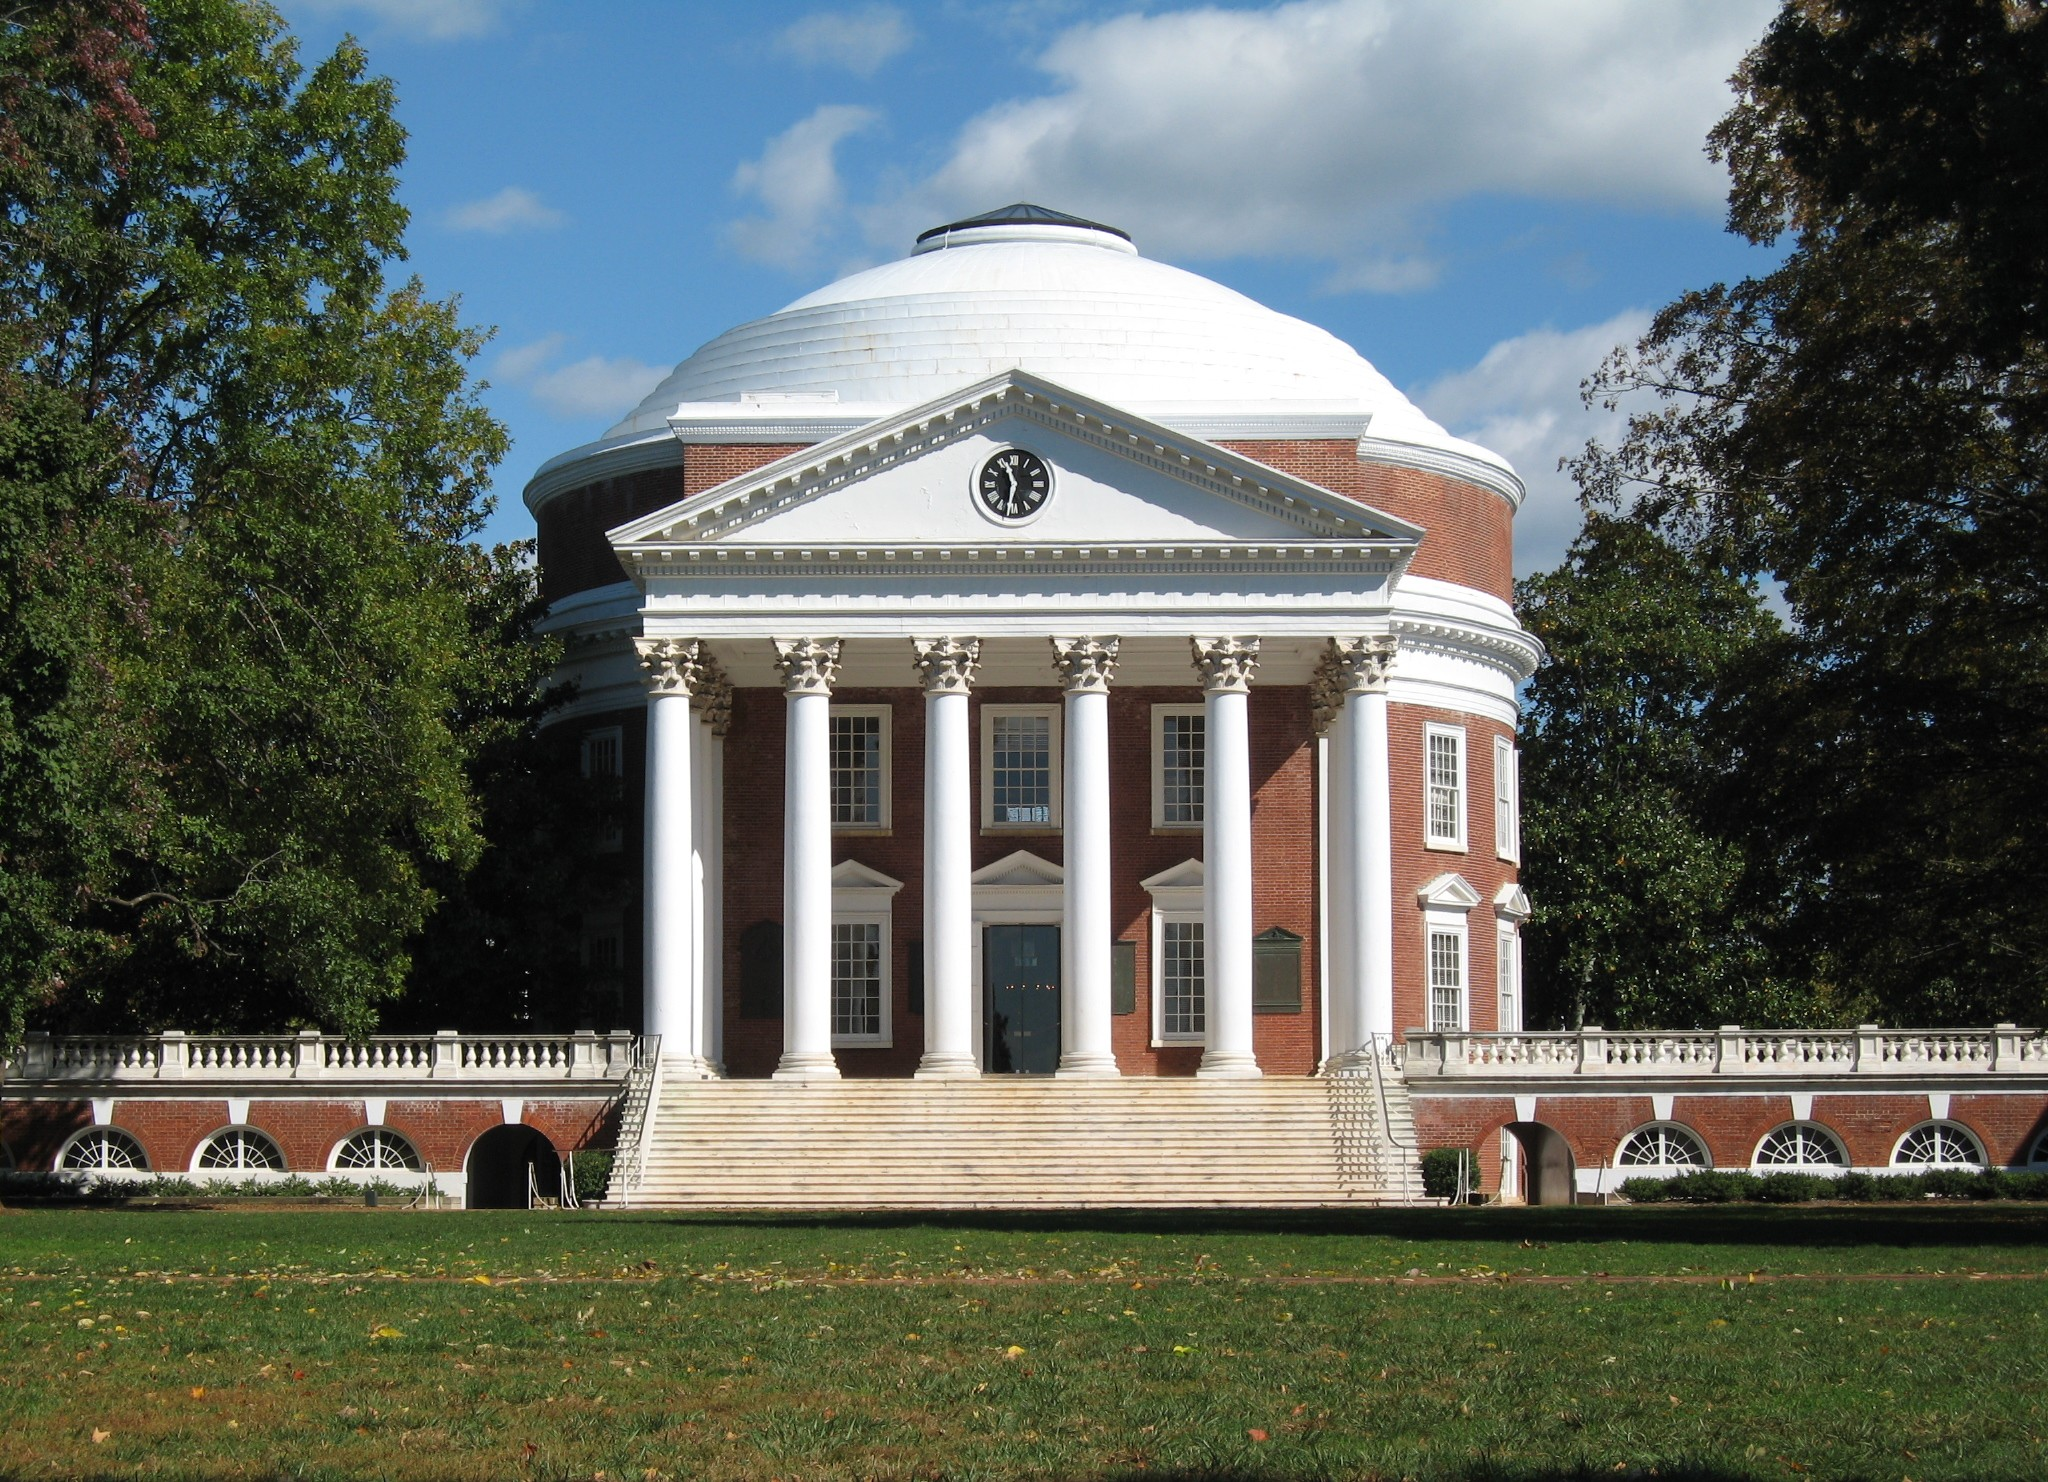 University of Virginia (UVA)